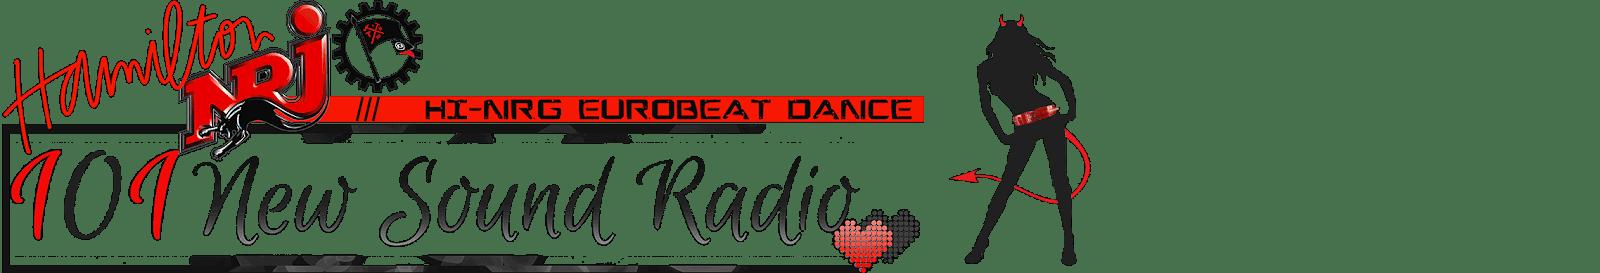 101 New Sound Radio